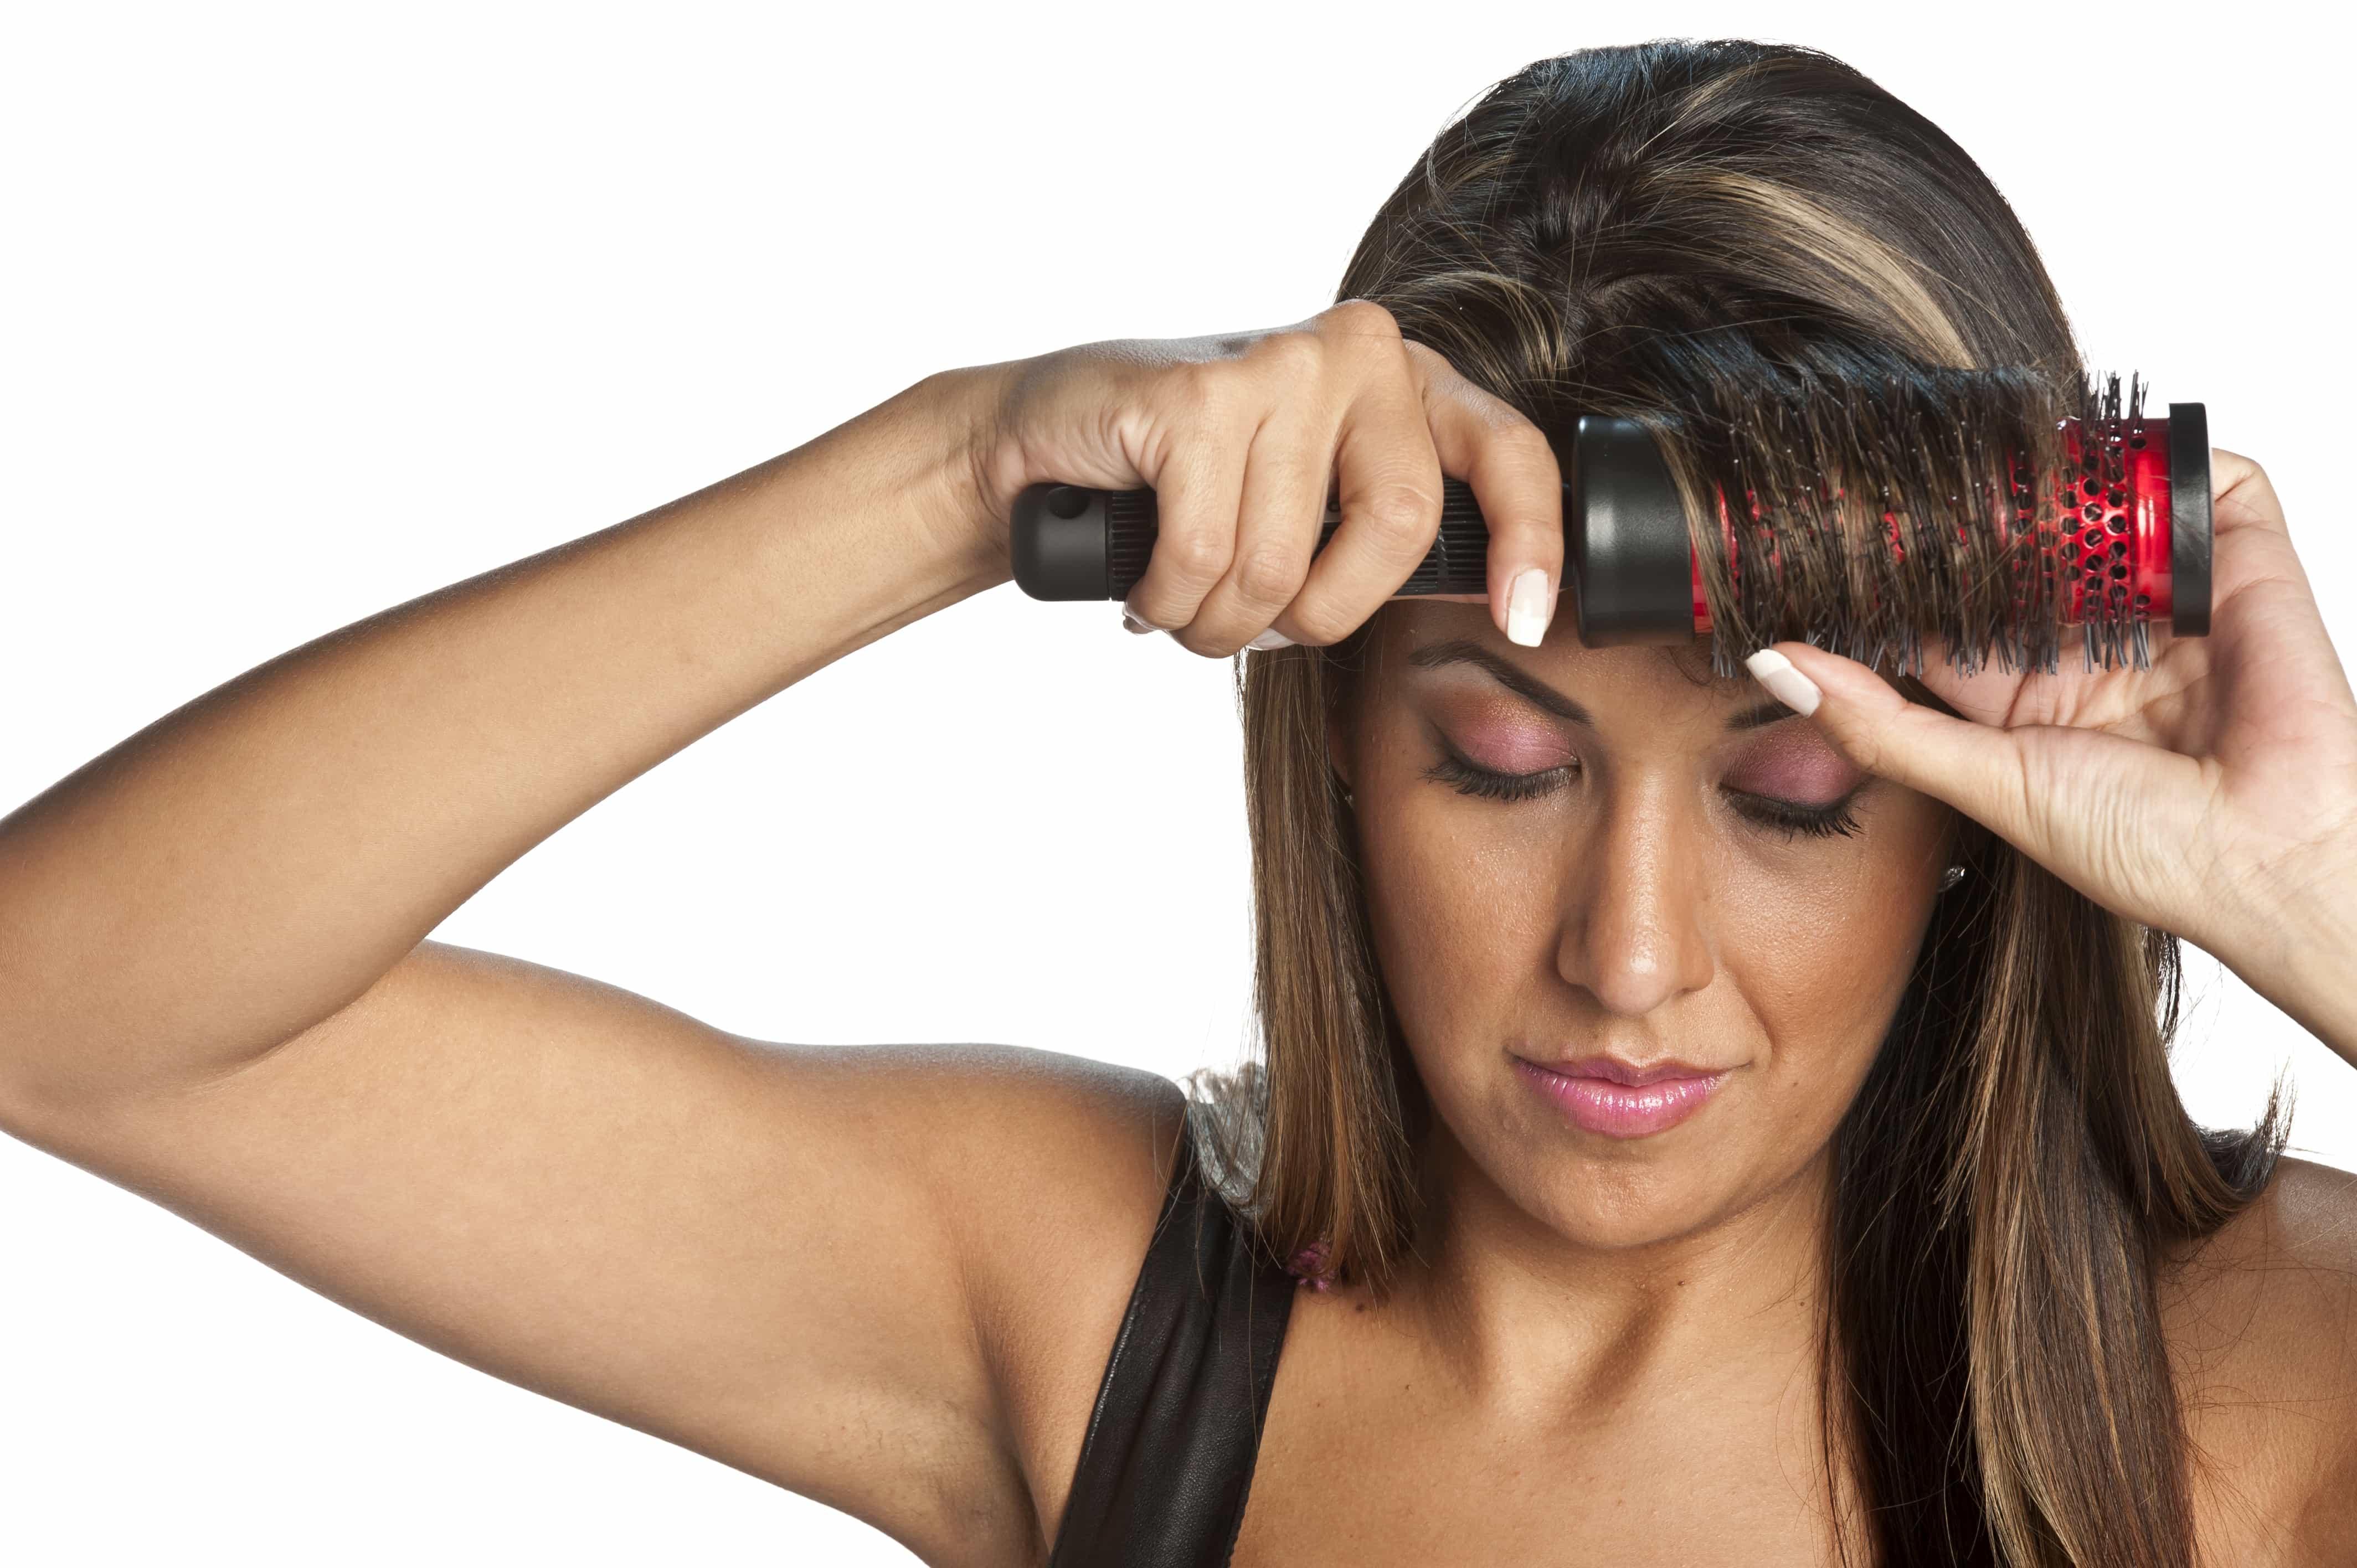 iStock 000019214490 Full - Seis principais problemas dos cabelos